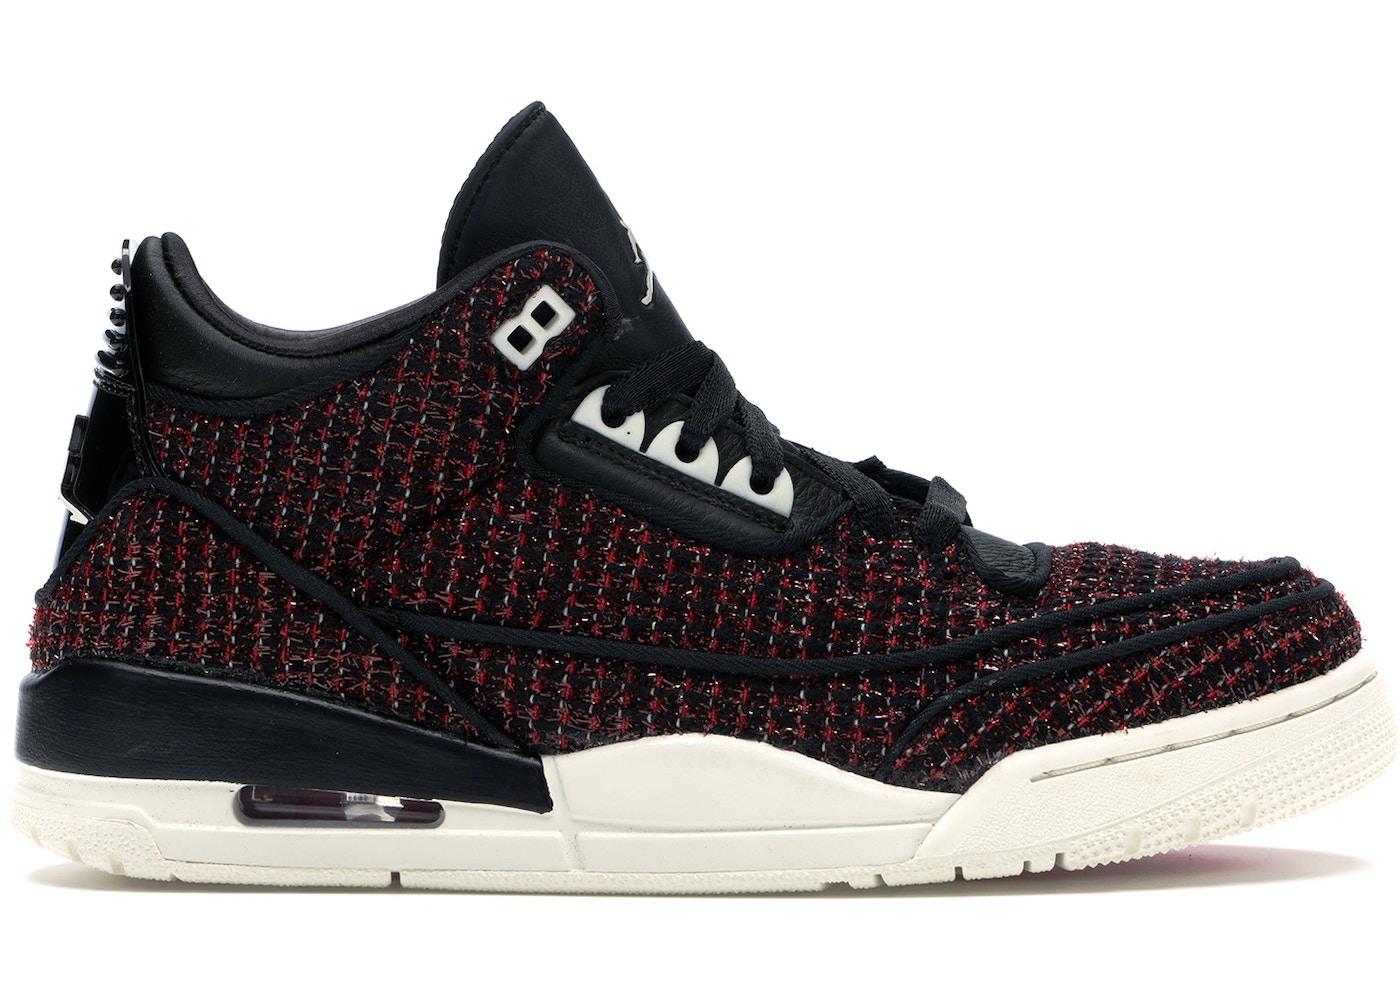 4712688dd2435 Air Jordan 3 Shoes - Release Date